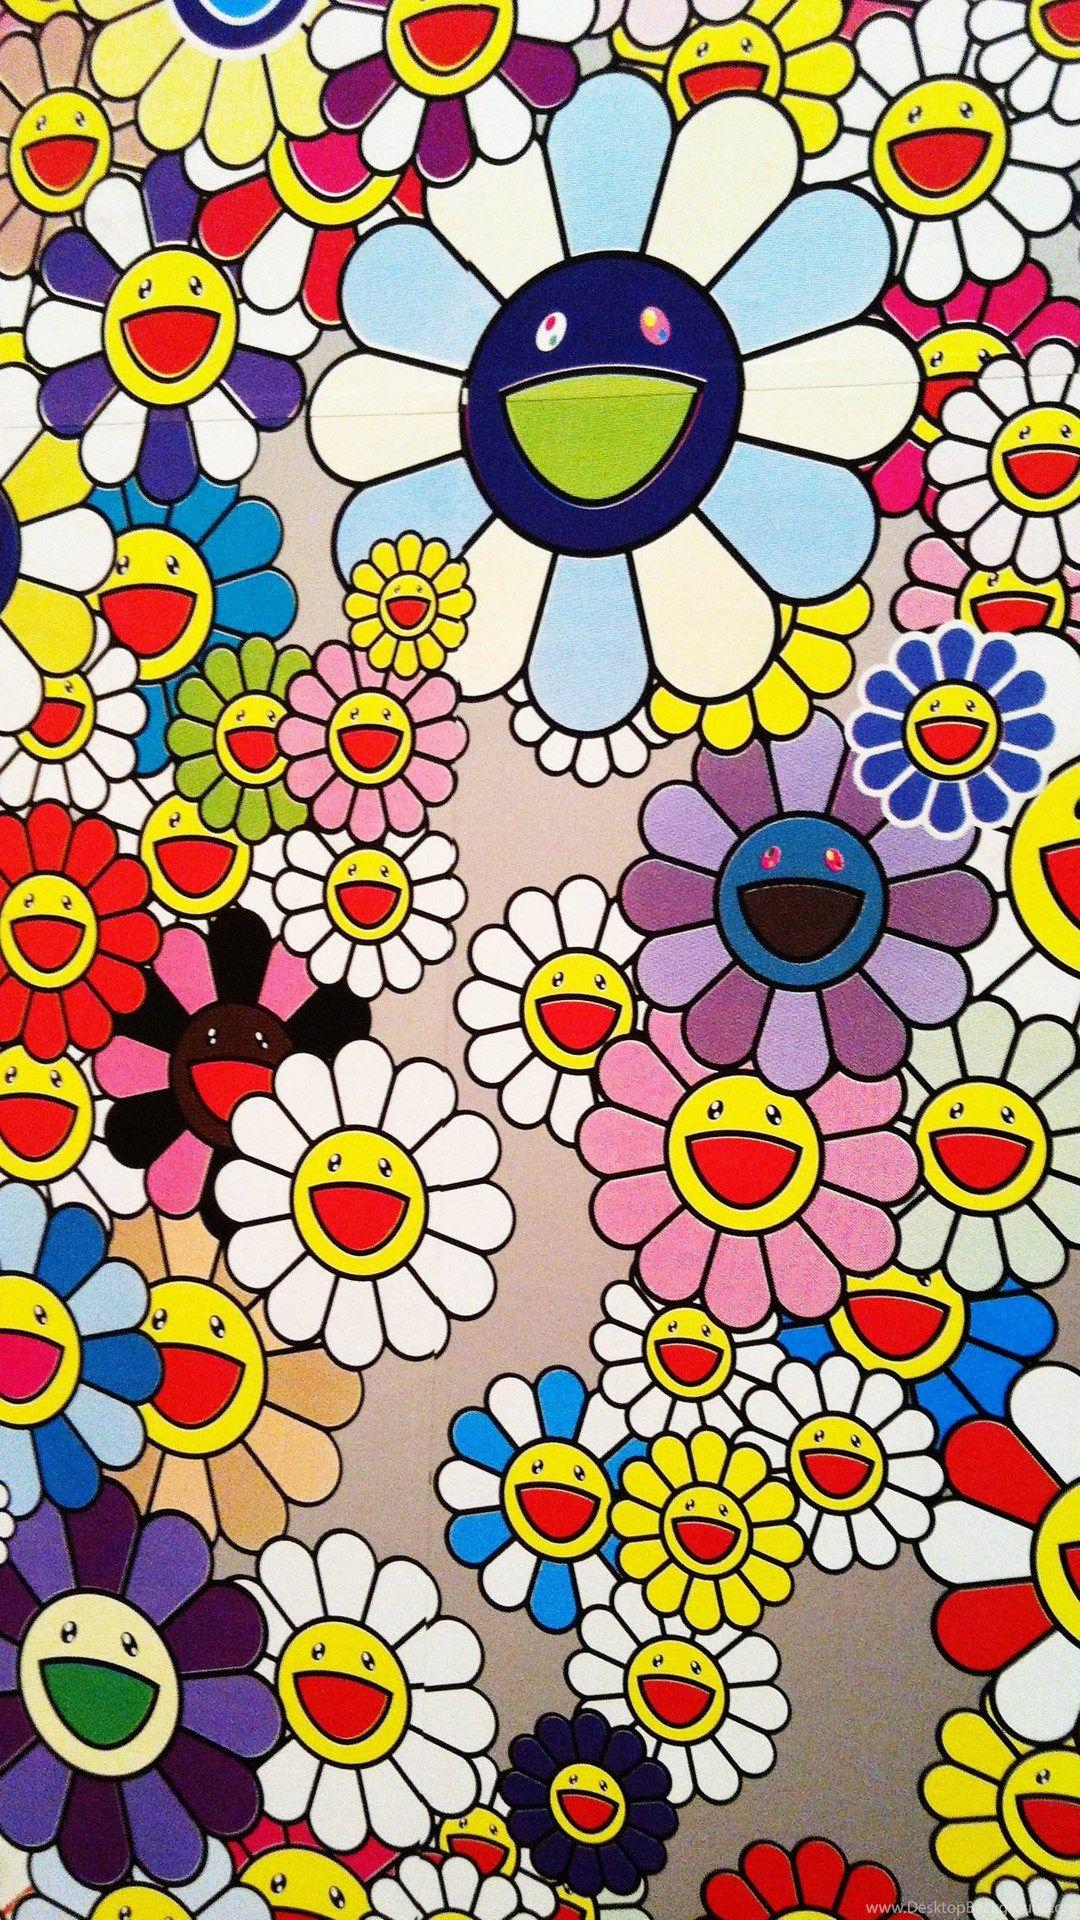 Takashi Murakami iPhone wallpaper high quality